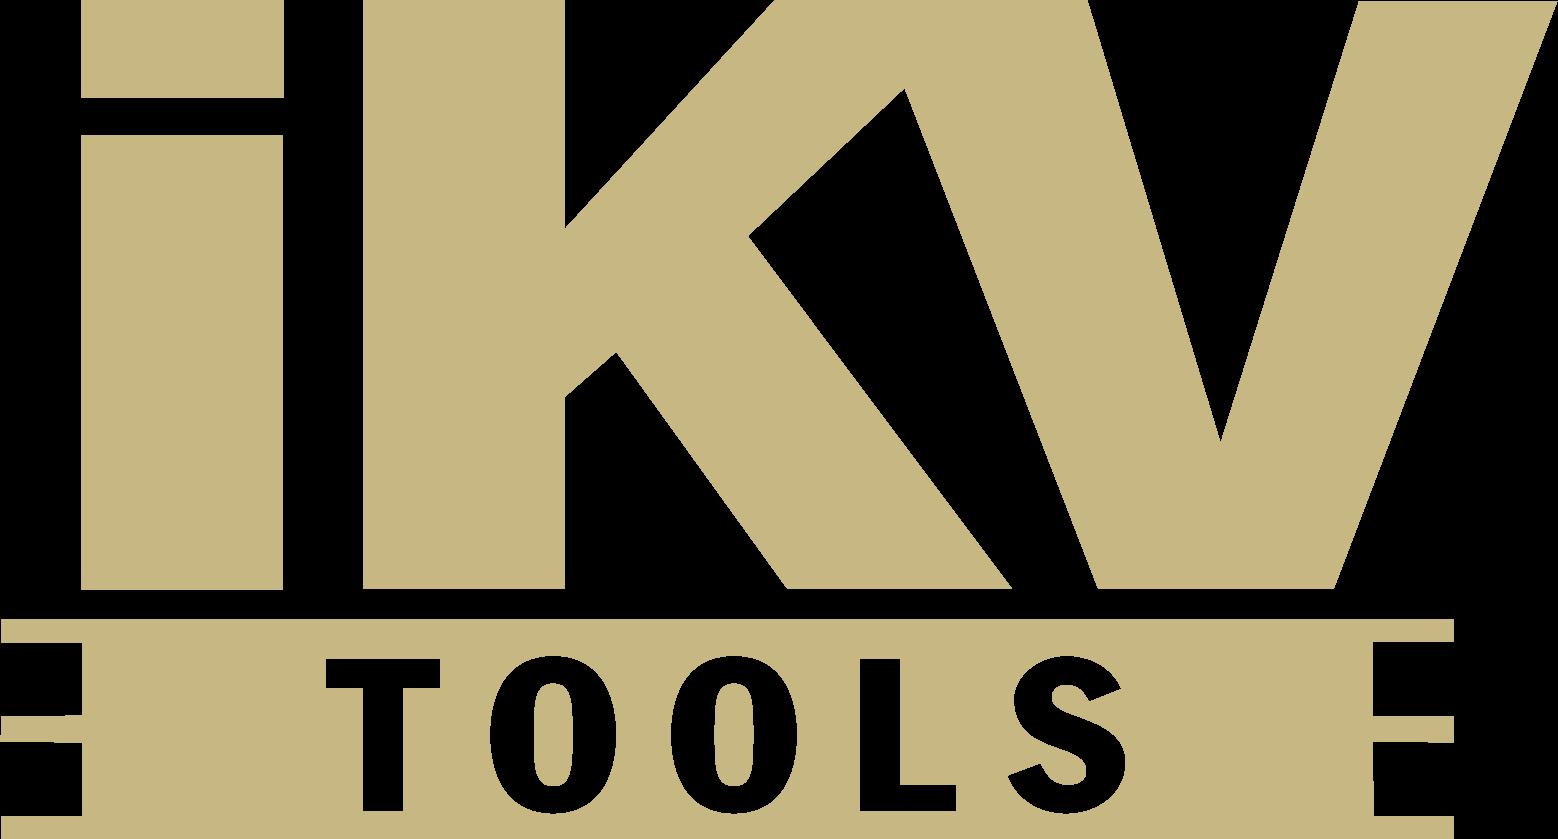 CNC-tekniker till IKV Tools AB i Forsheda